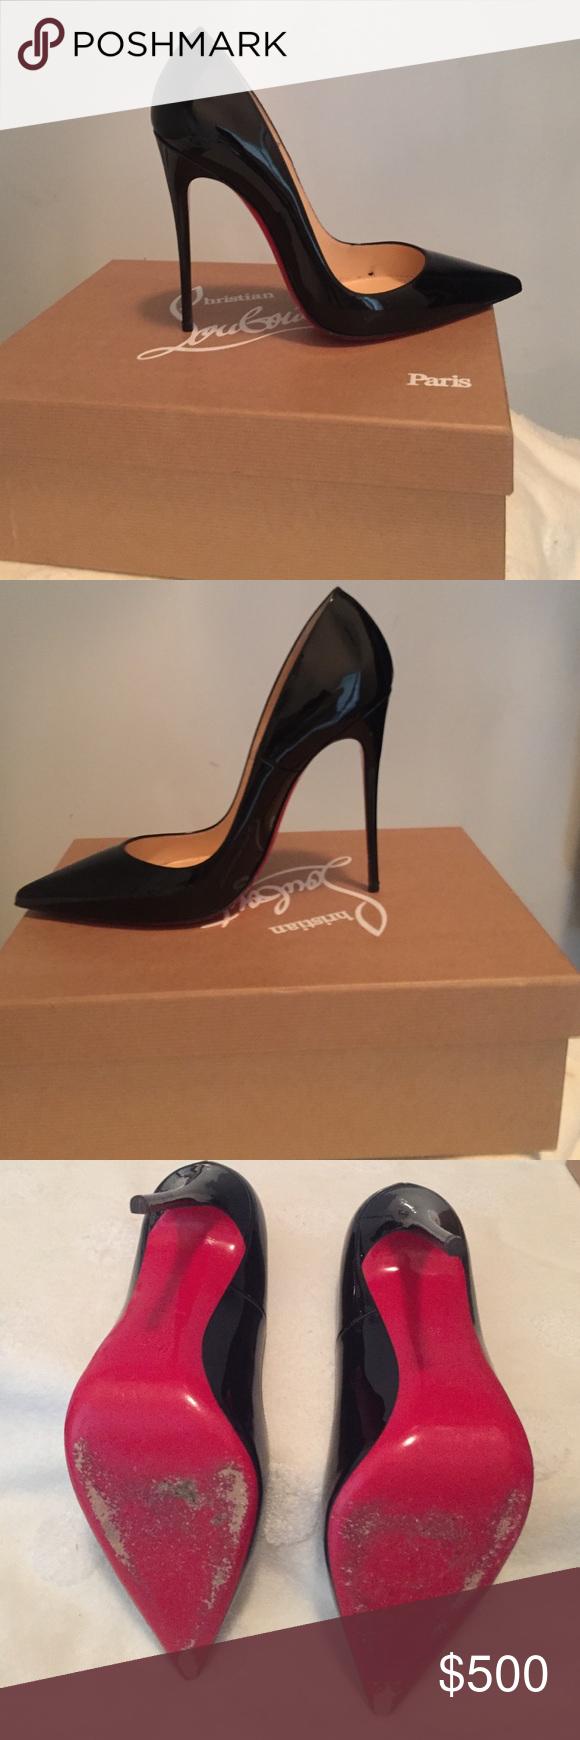 Christian Louboutin Zapato de barco gradient